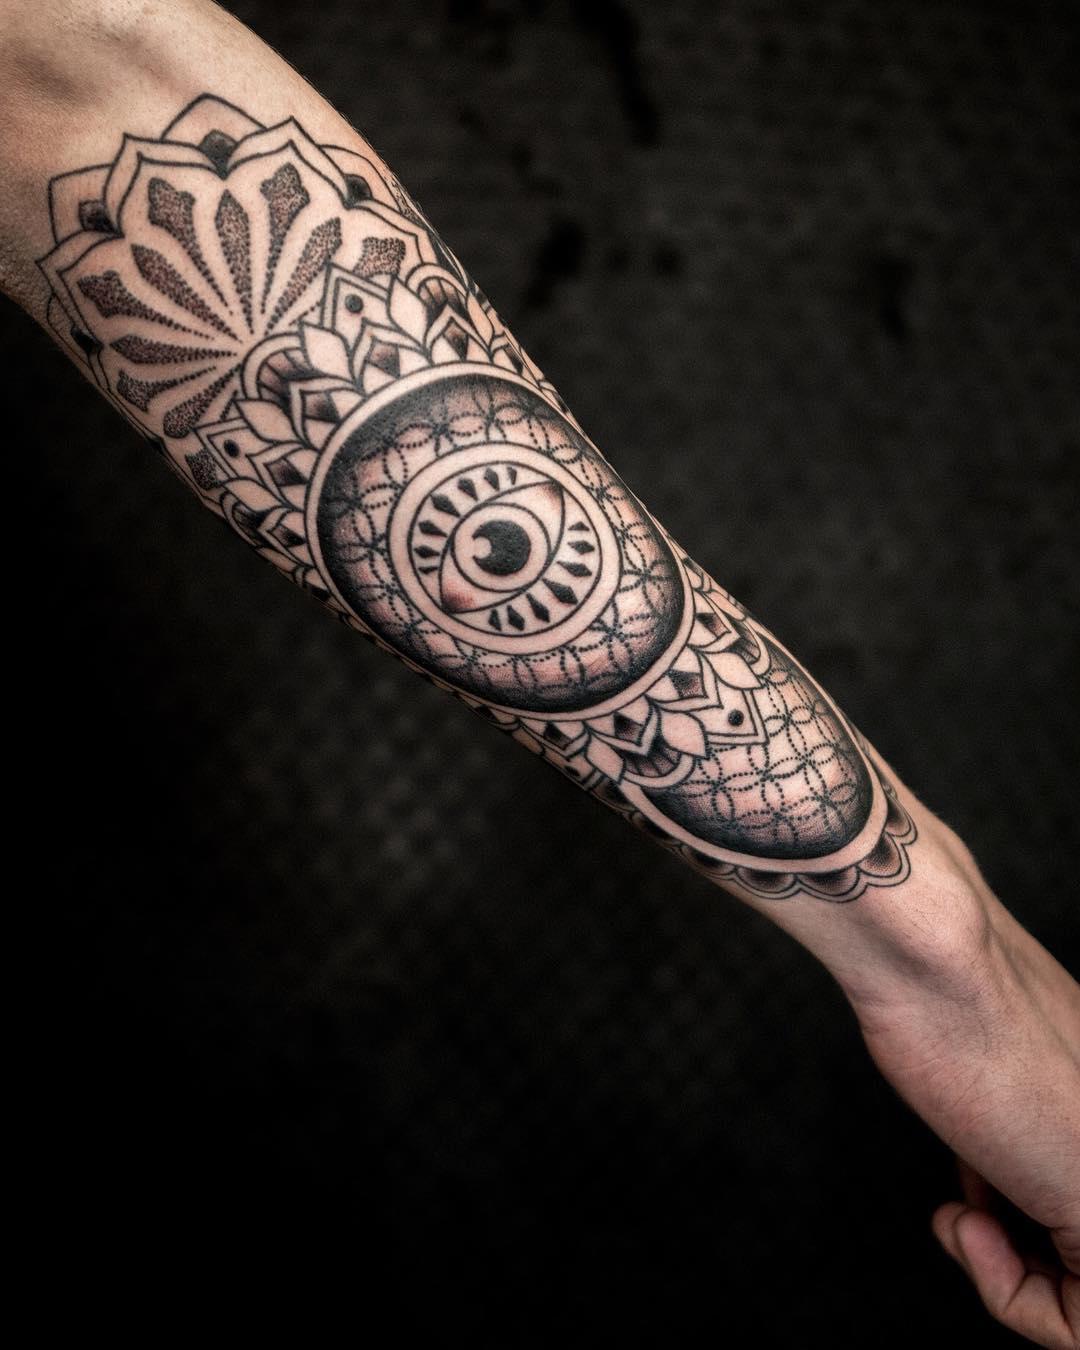 Geometric Tattoo Artists : geometric, tattoo, artists, Sacred, Geometry, Tattoos, Tattoo, Piercing, Artists, Denver